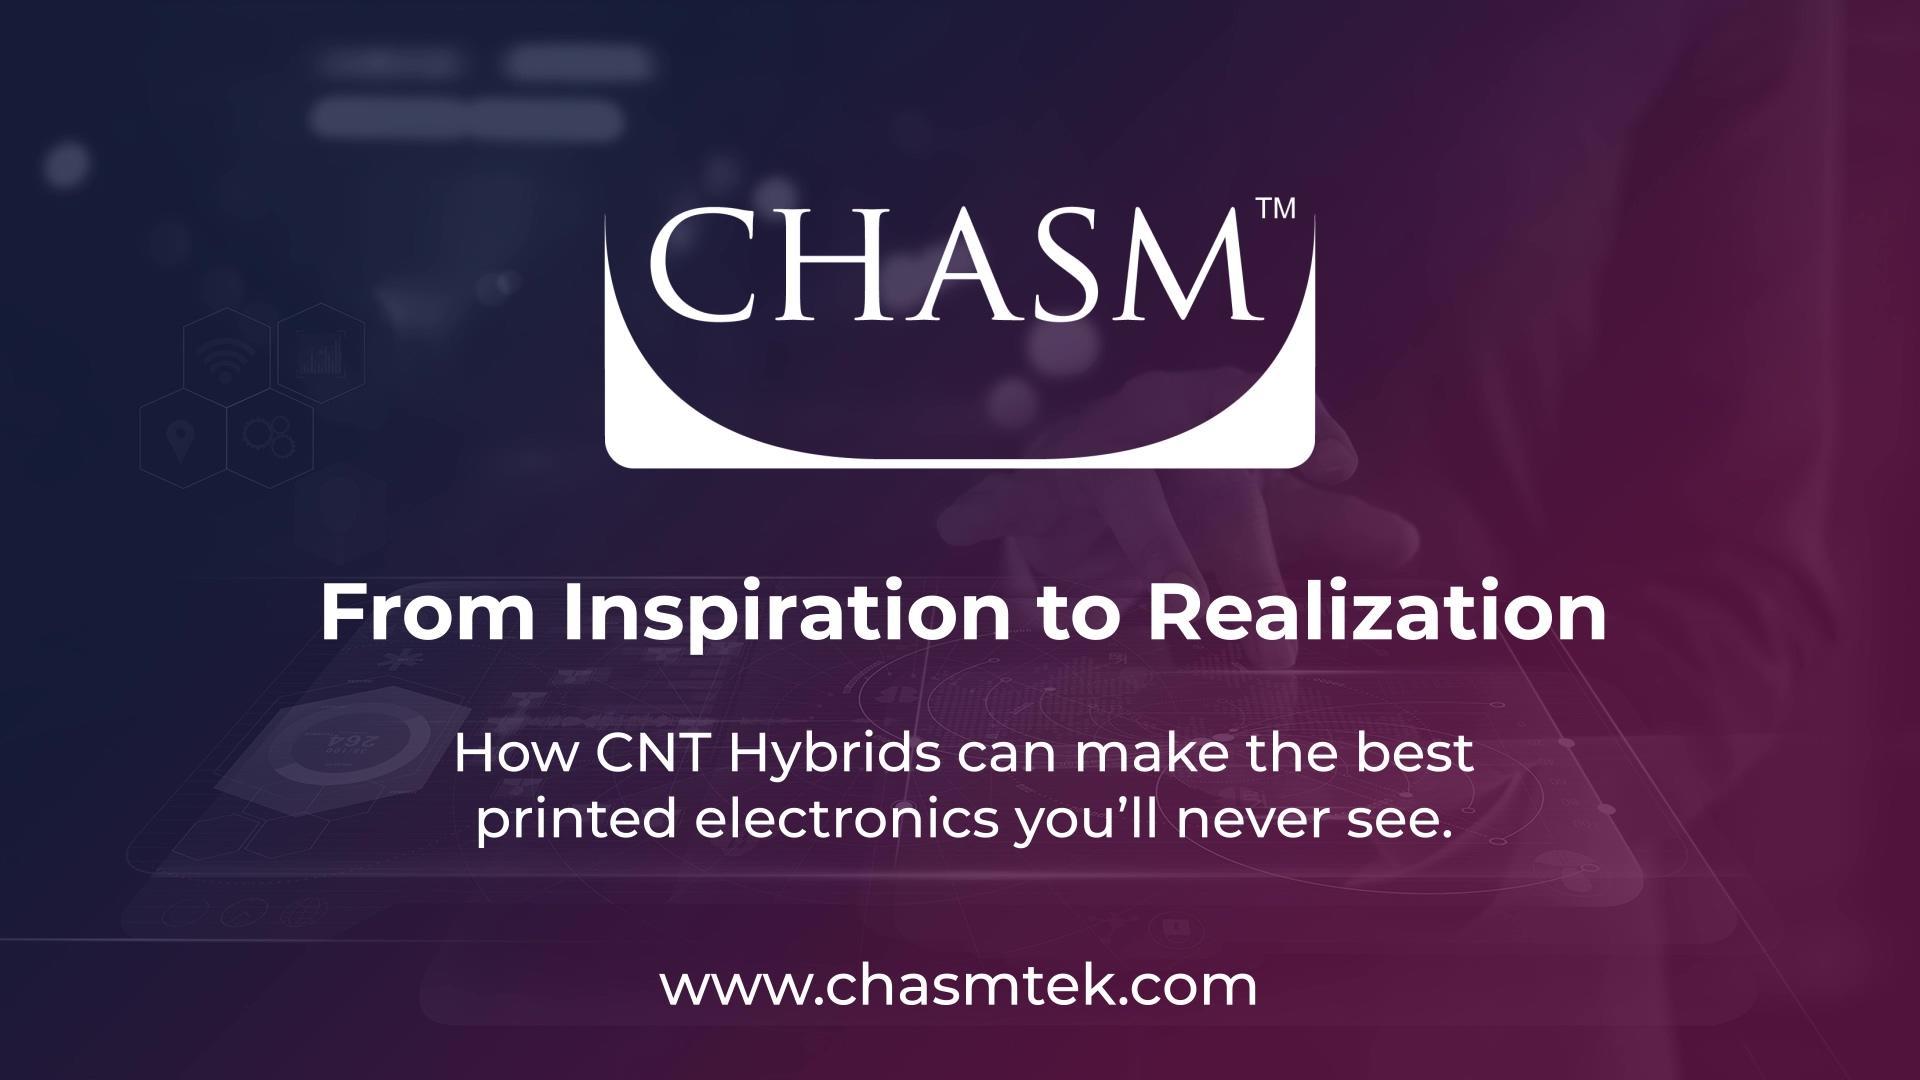 ( WEBINAR ) From Inspiration to Realization - CNT Hybrids